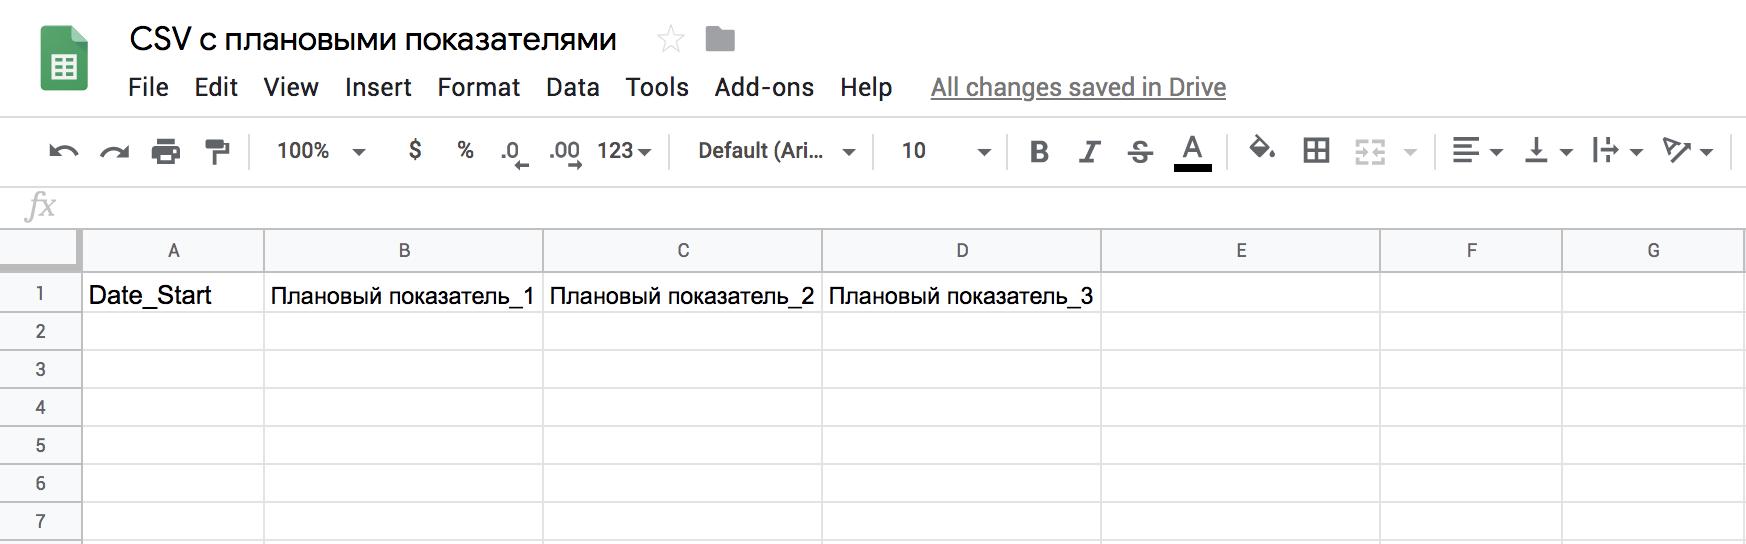 Структура CSV-файла для отчета план/факт за месяц